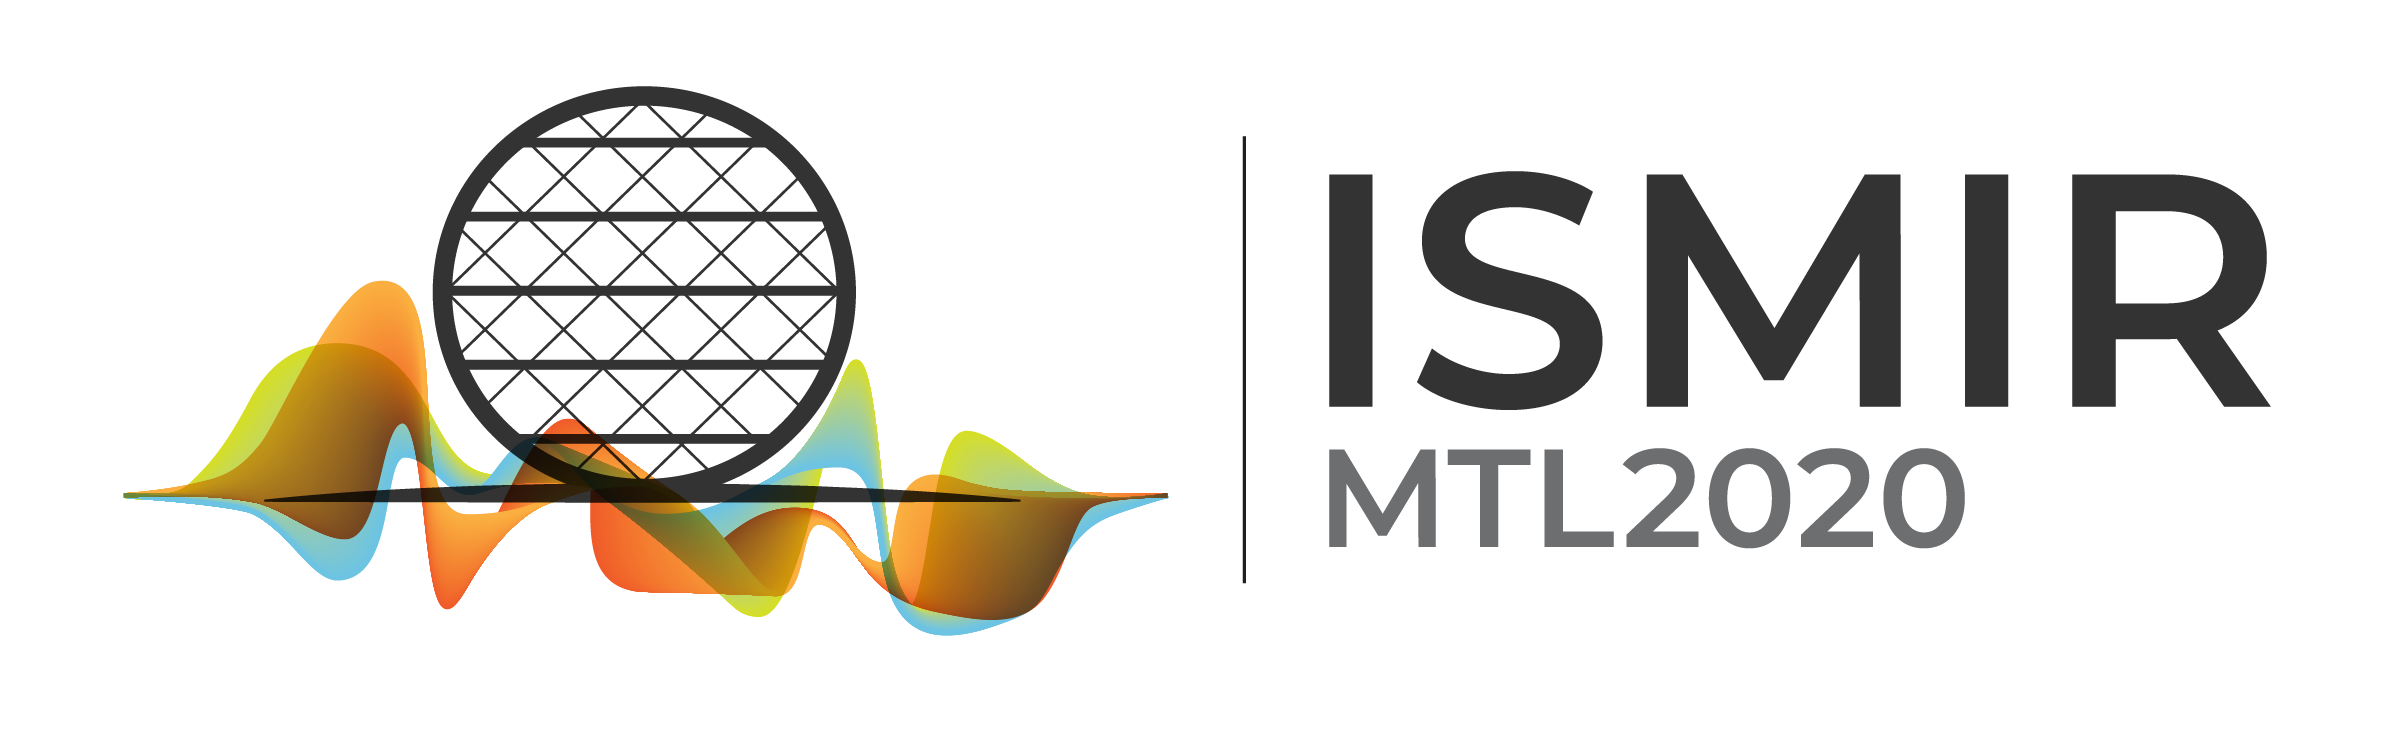 ISMIR 2020 Logo